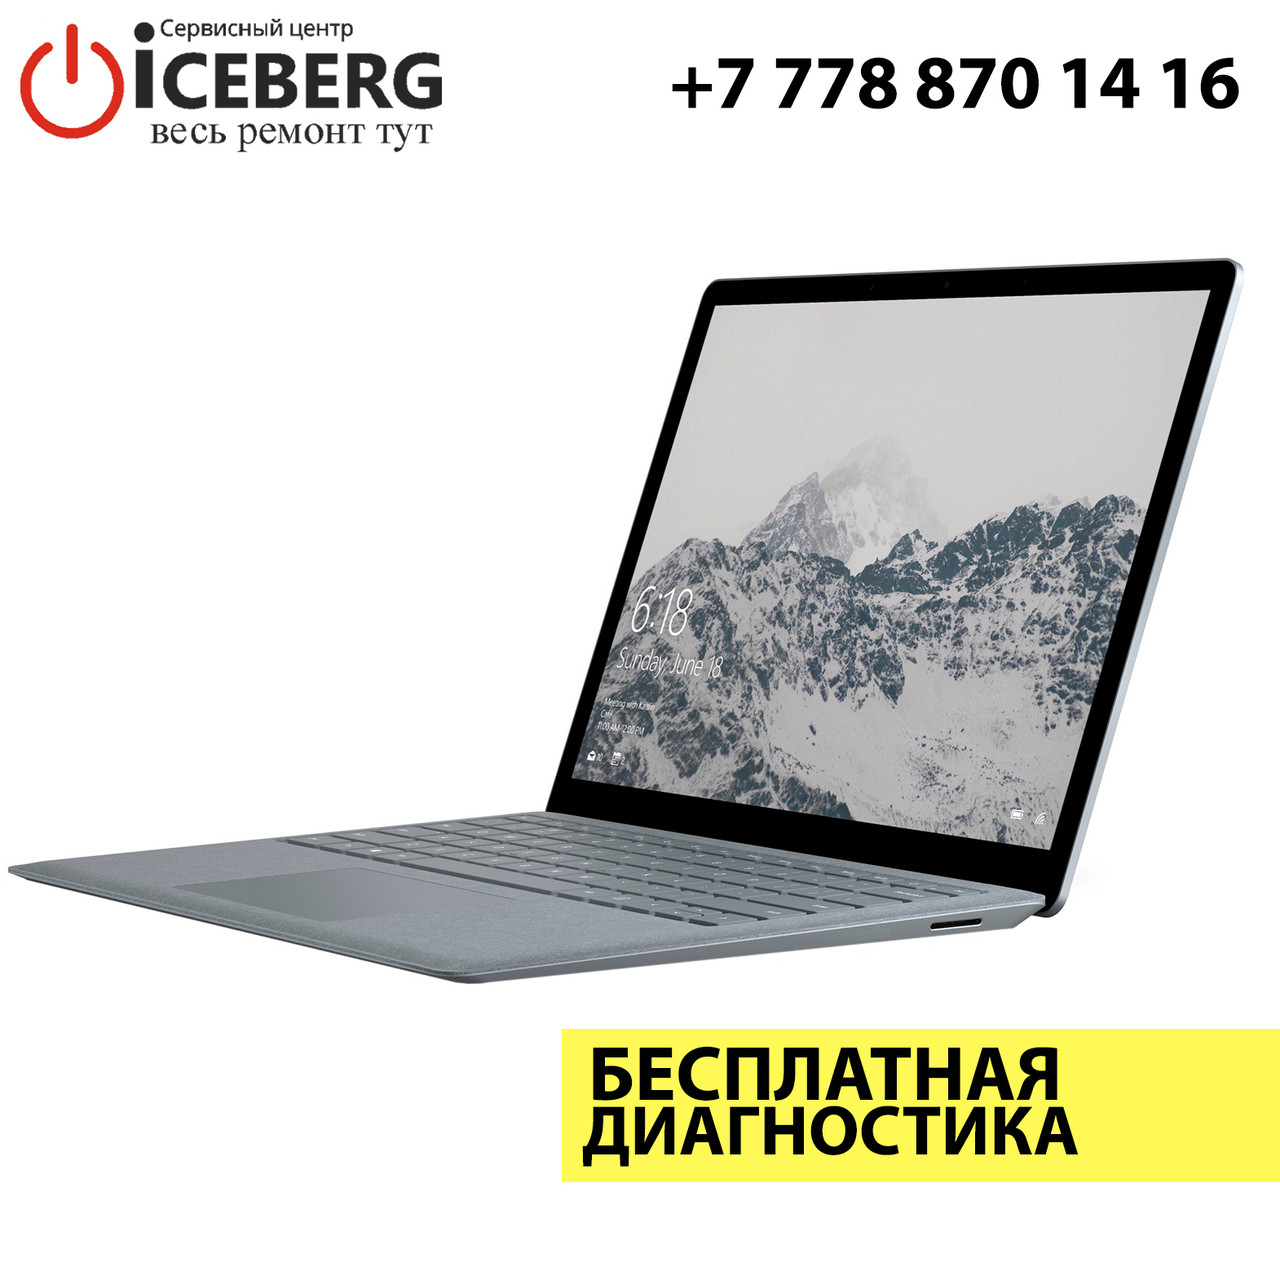 Ремонт ноутбуков Microsoft Surface